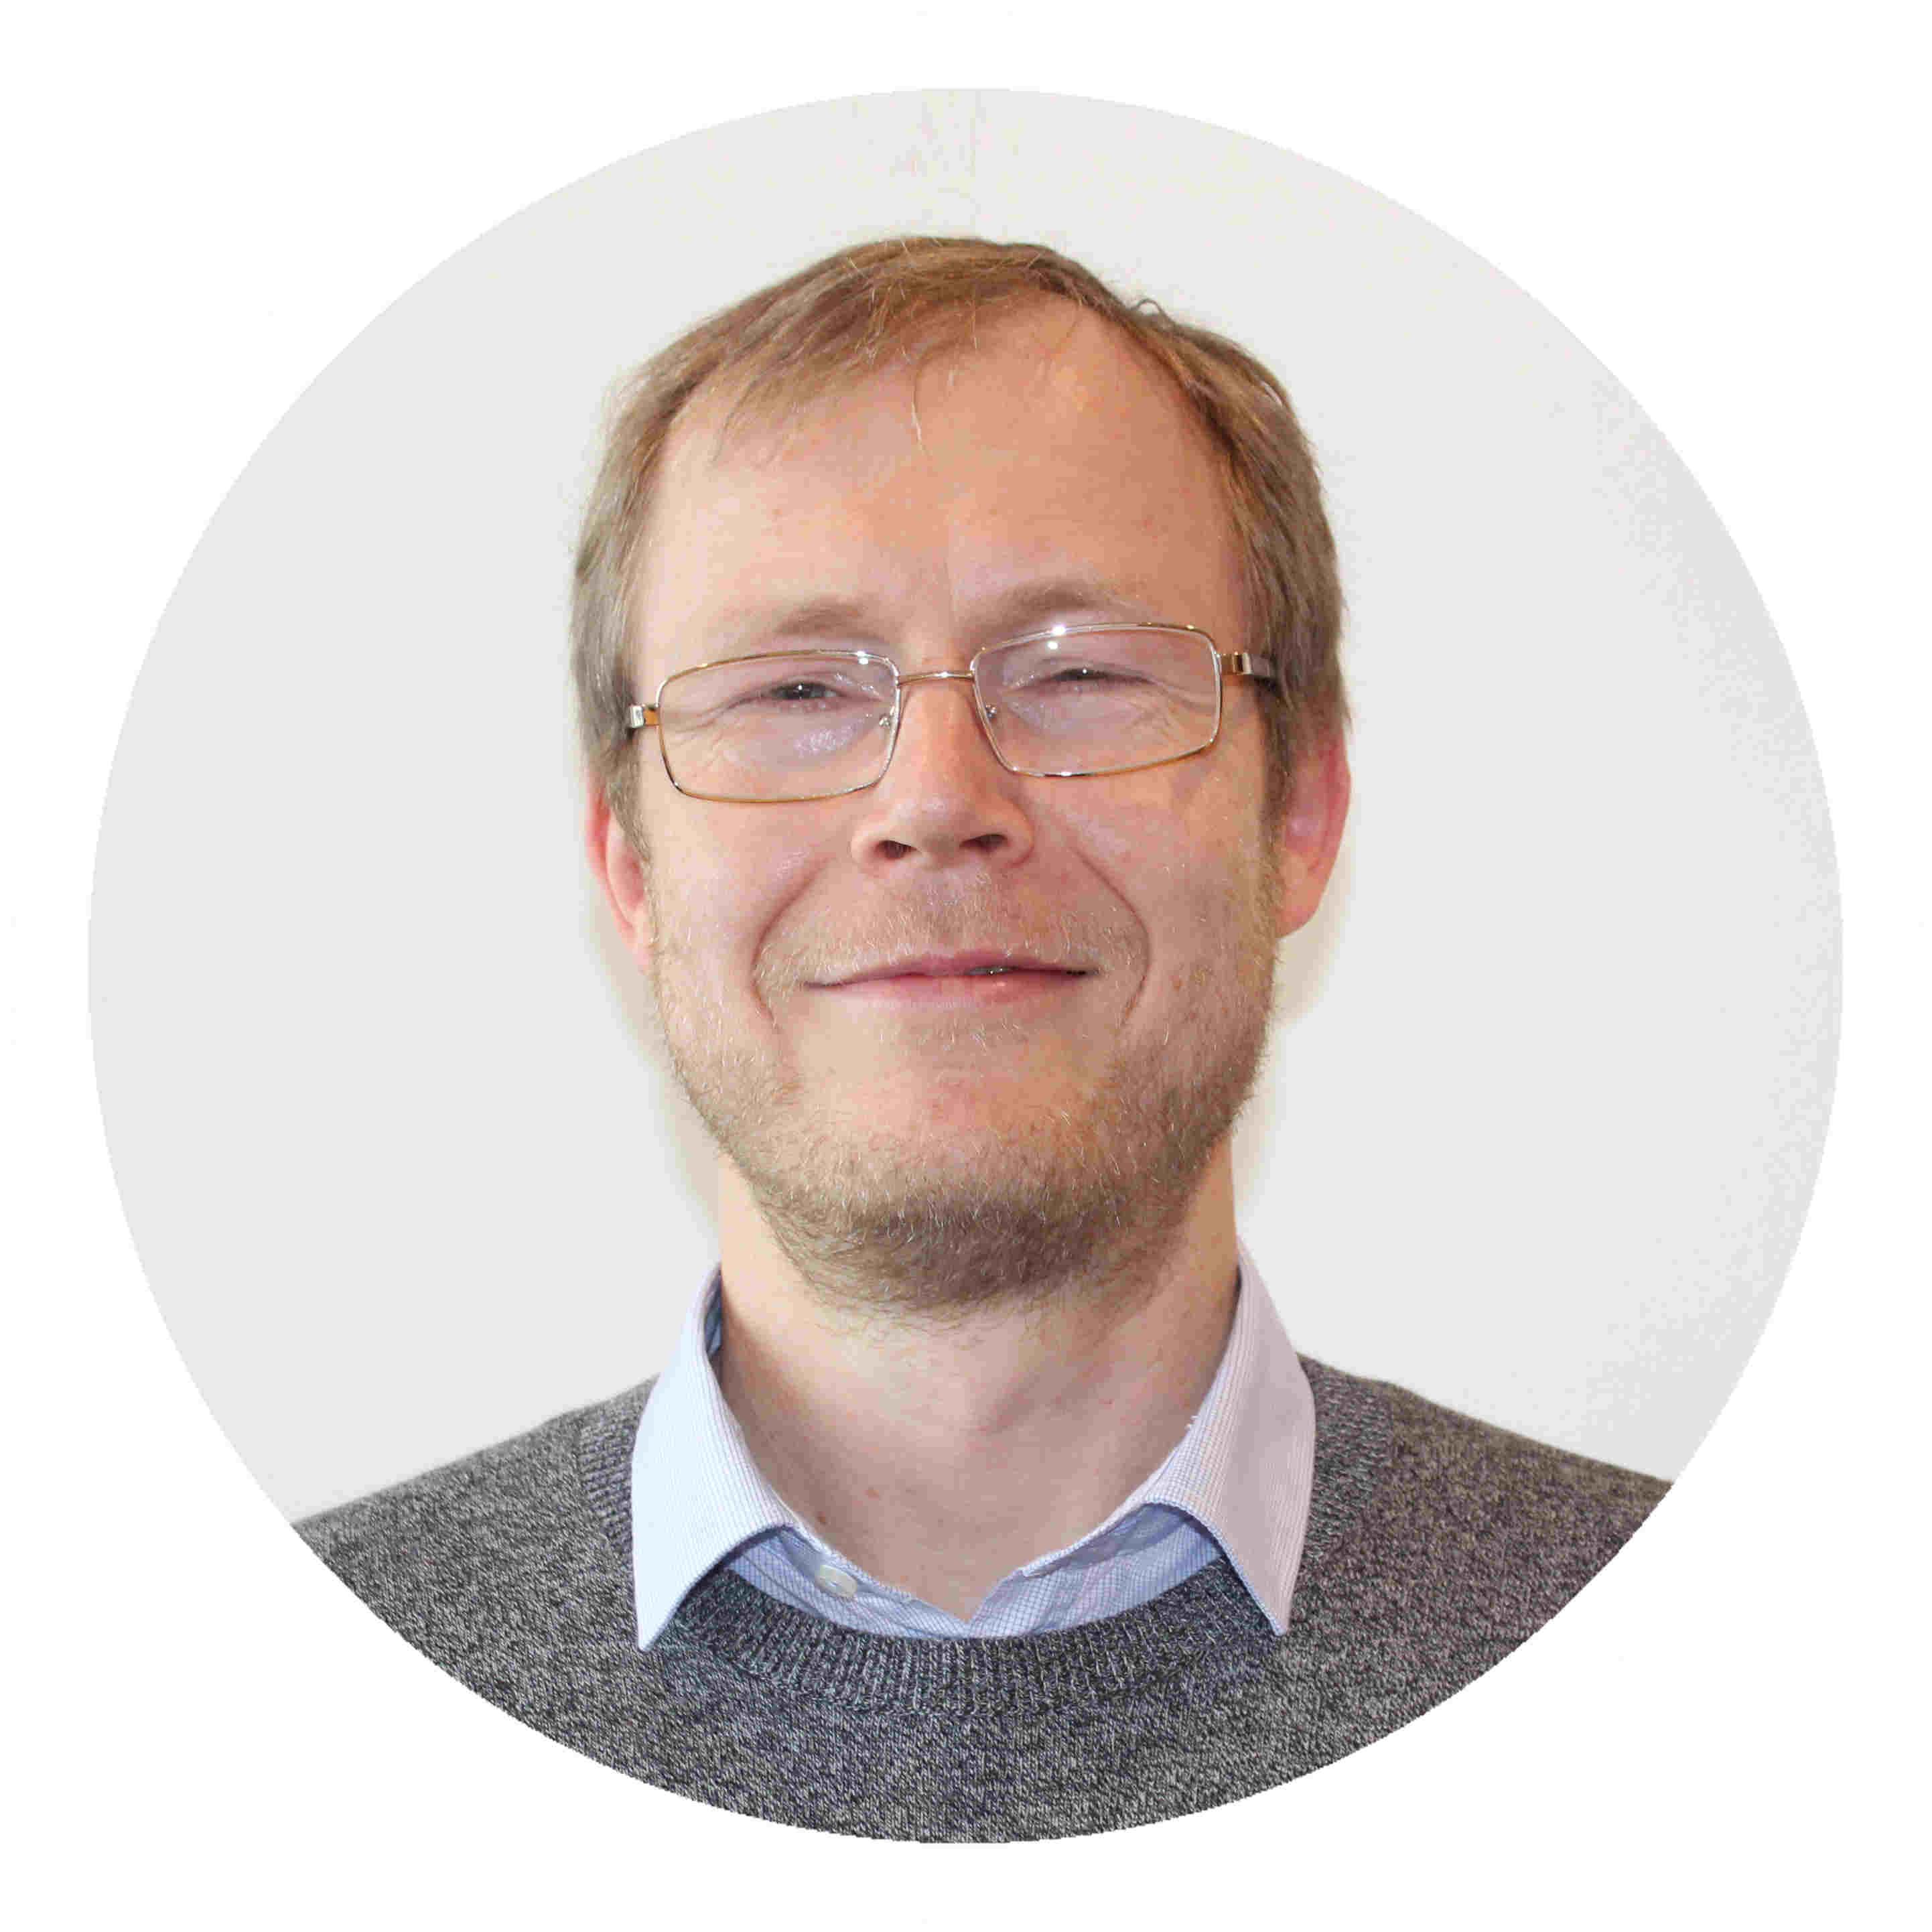 Almac Group Appoints Dr Stefan Mix as Head of Biocatalysis